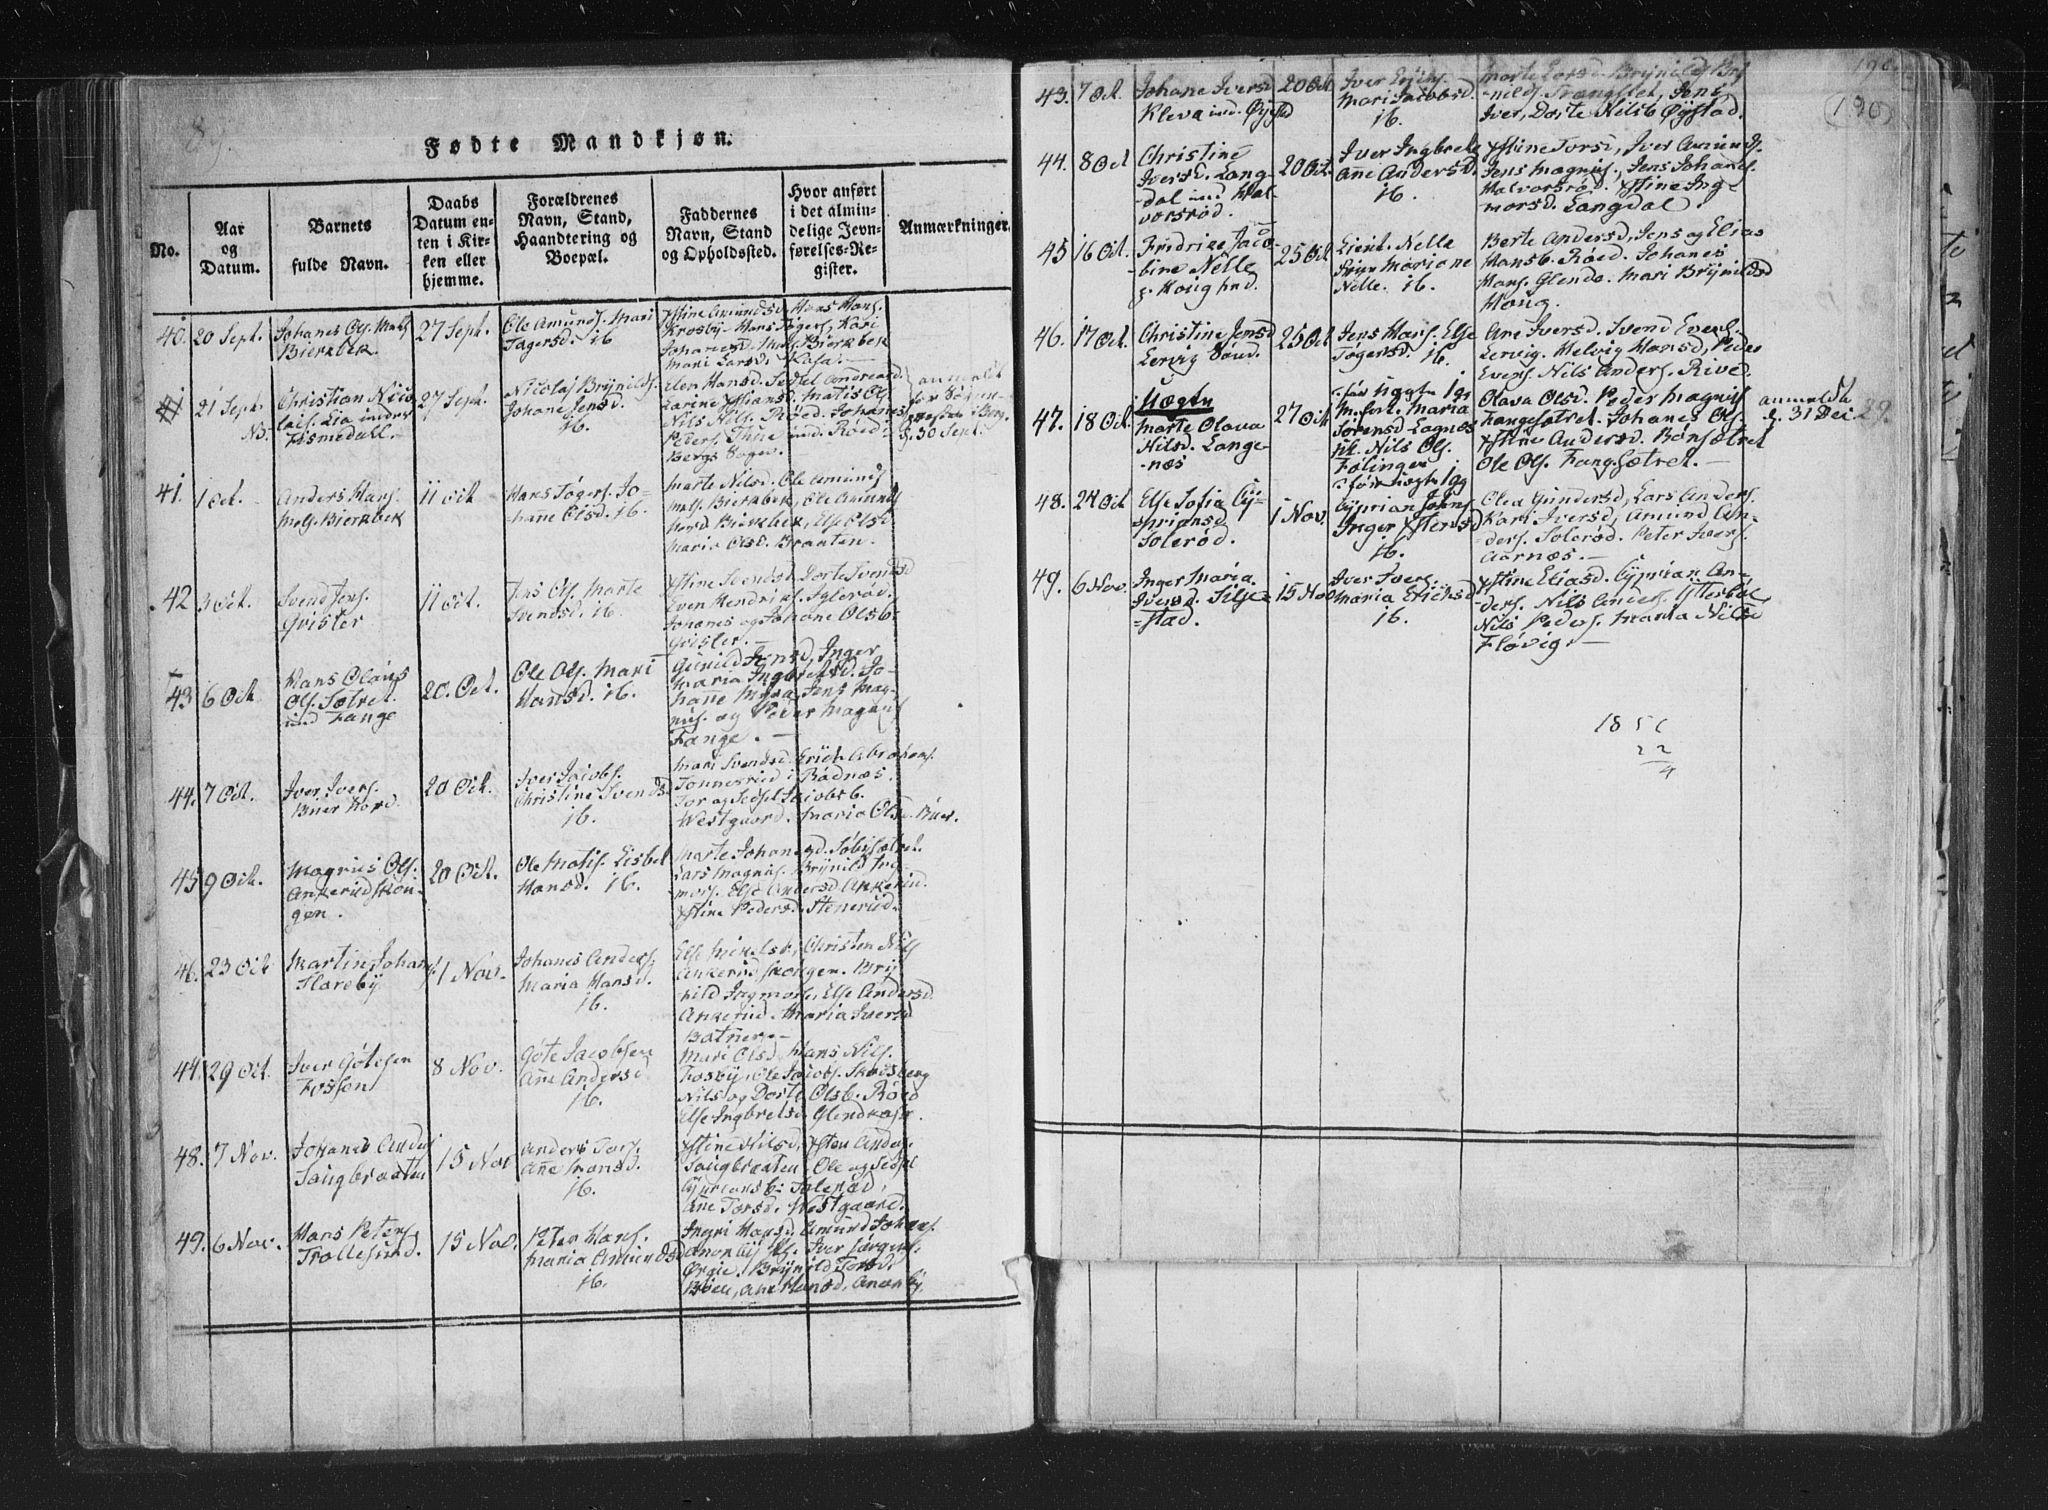 SAO, Aremark prestekontor Kirkebøker, F/Fc/L0001: Ministerialbok nr. III 1, 1814-1834, s. 189-190